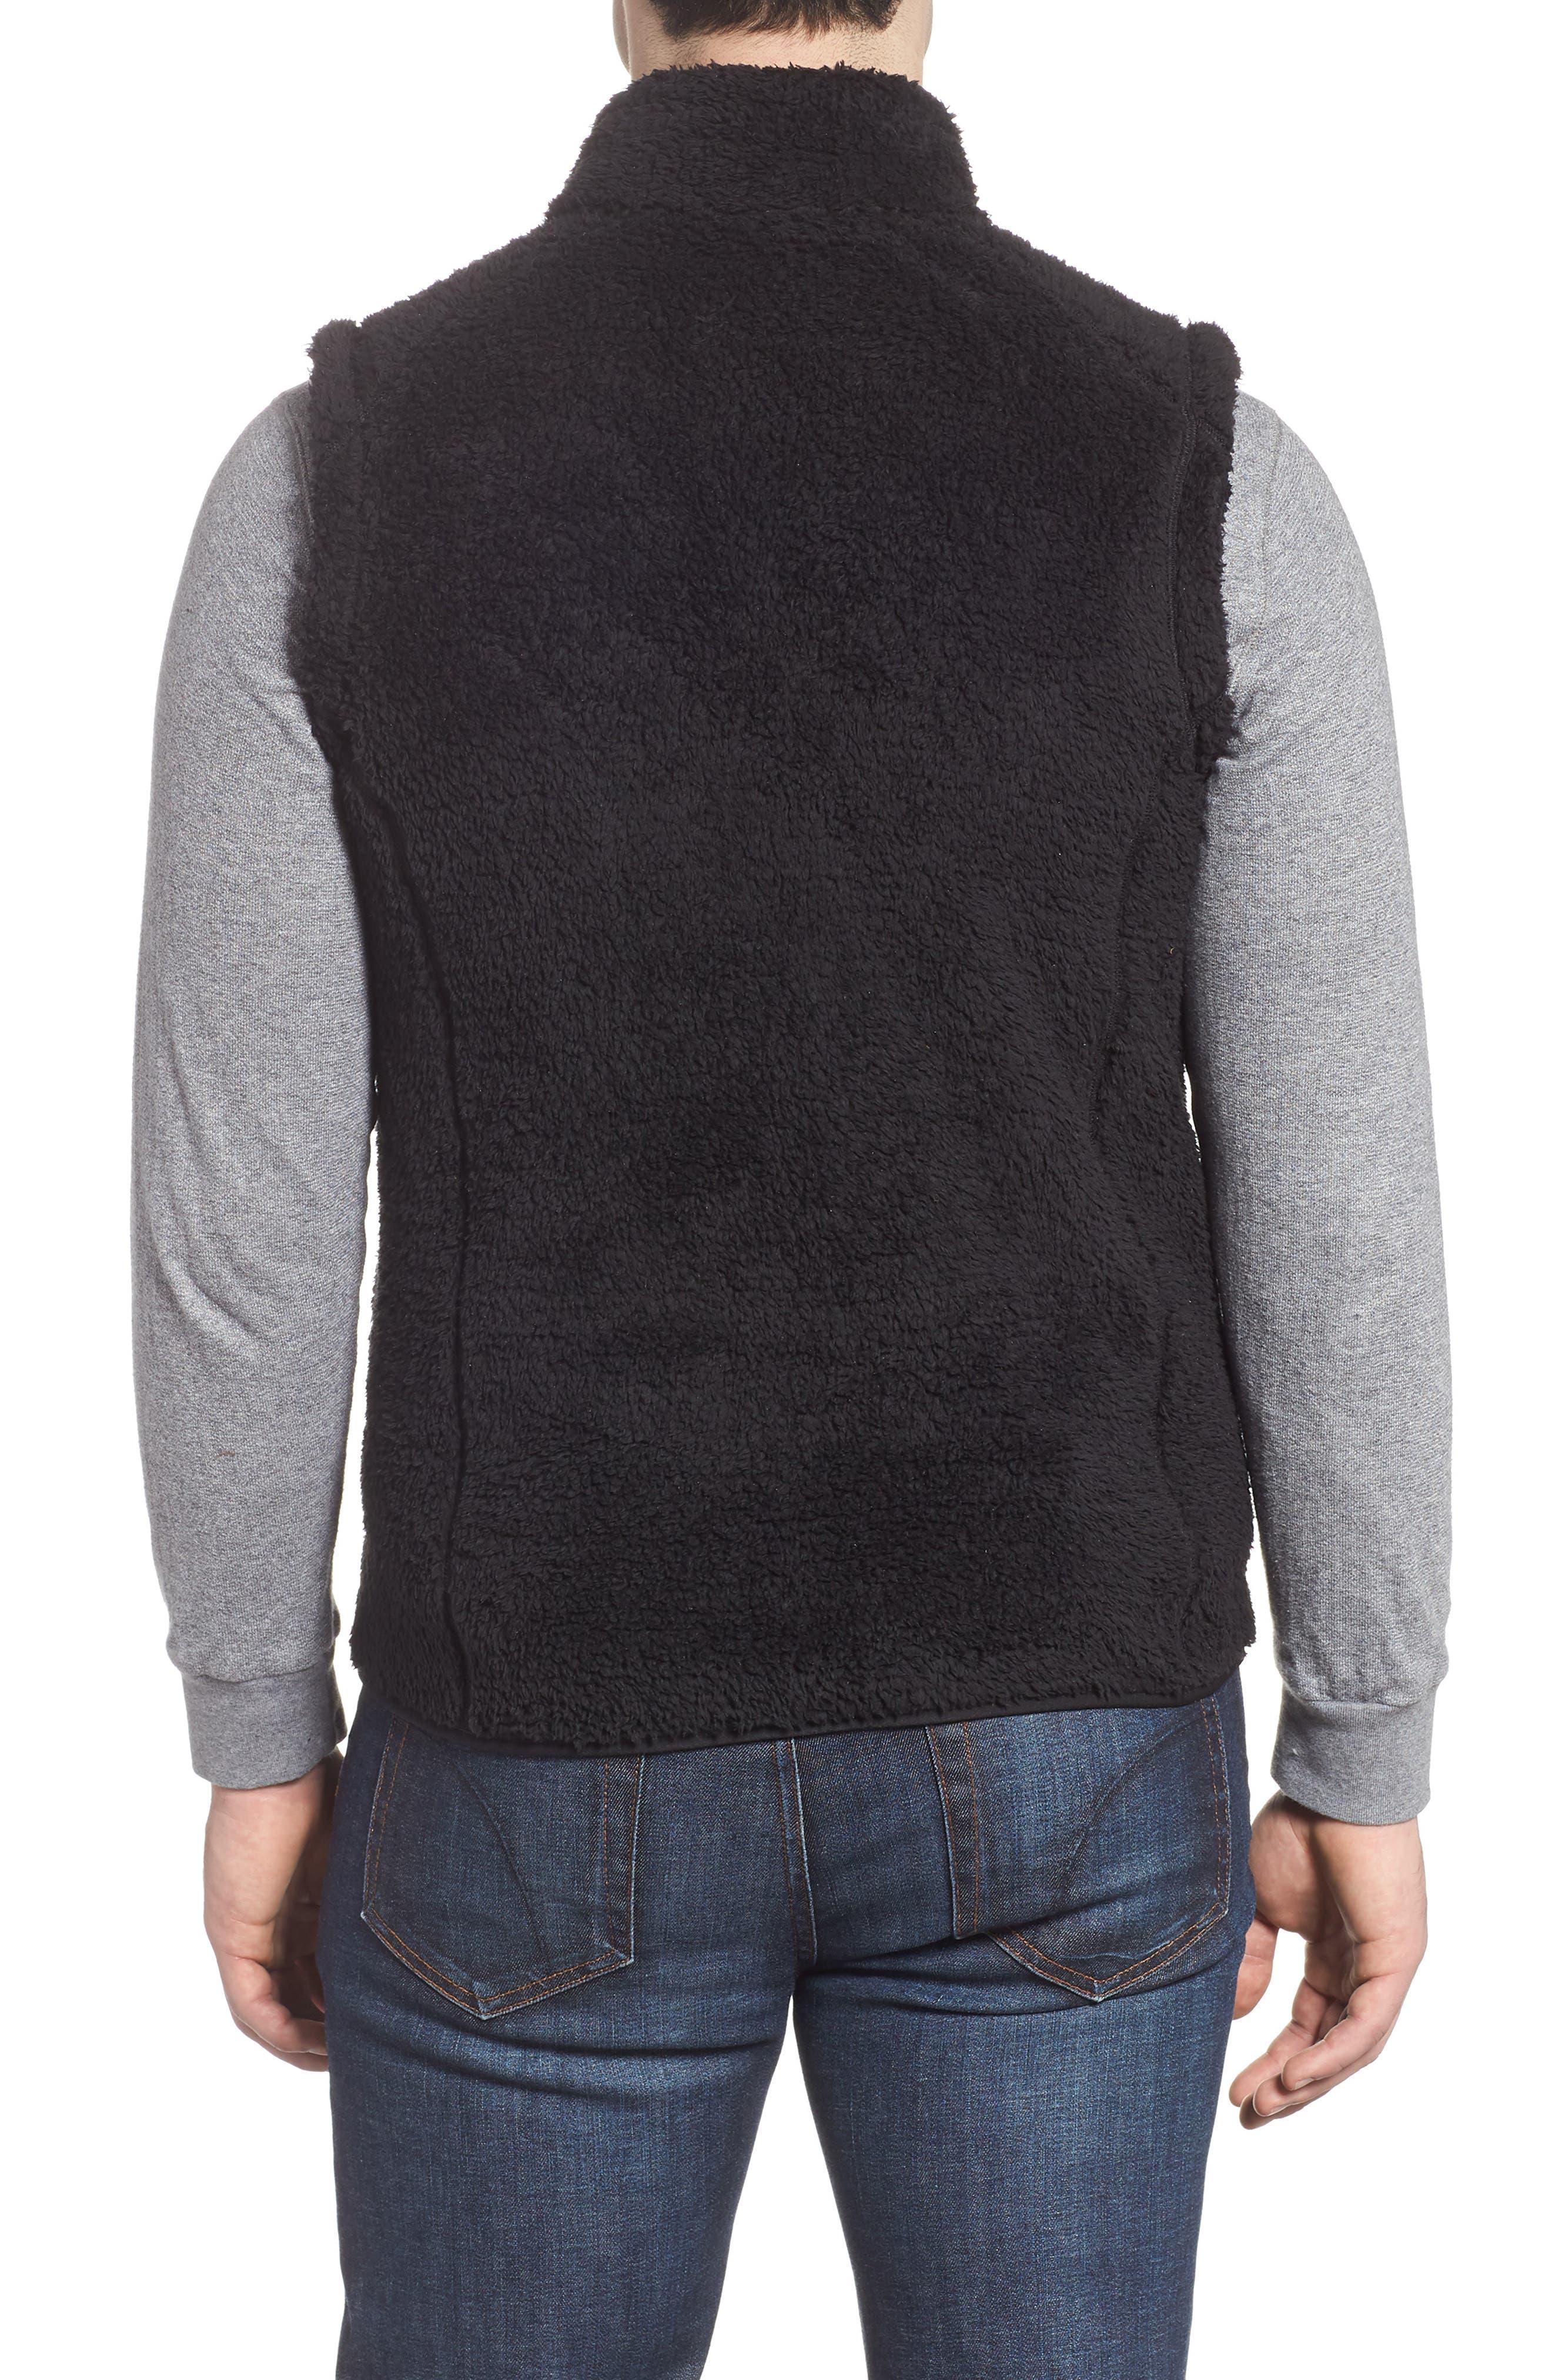 Los Gatos Fleece Vest,                             Alternate thumbnail 2, color,                             BLACK